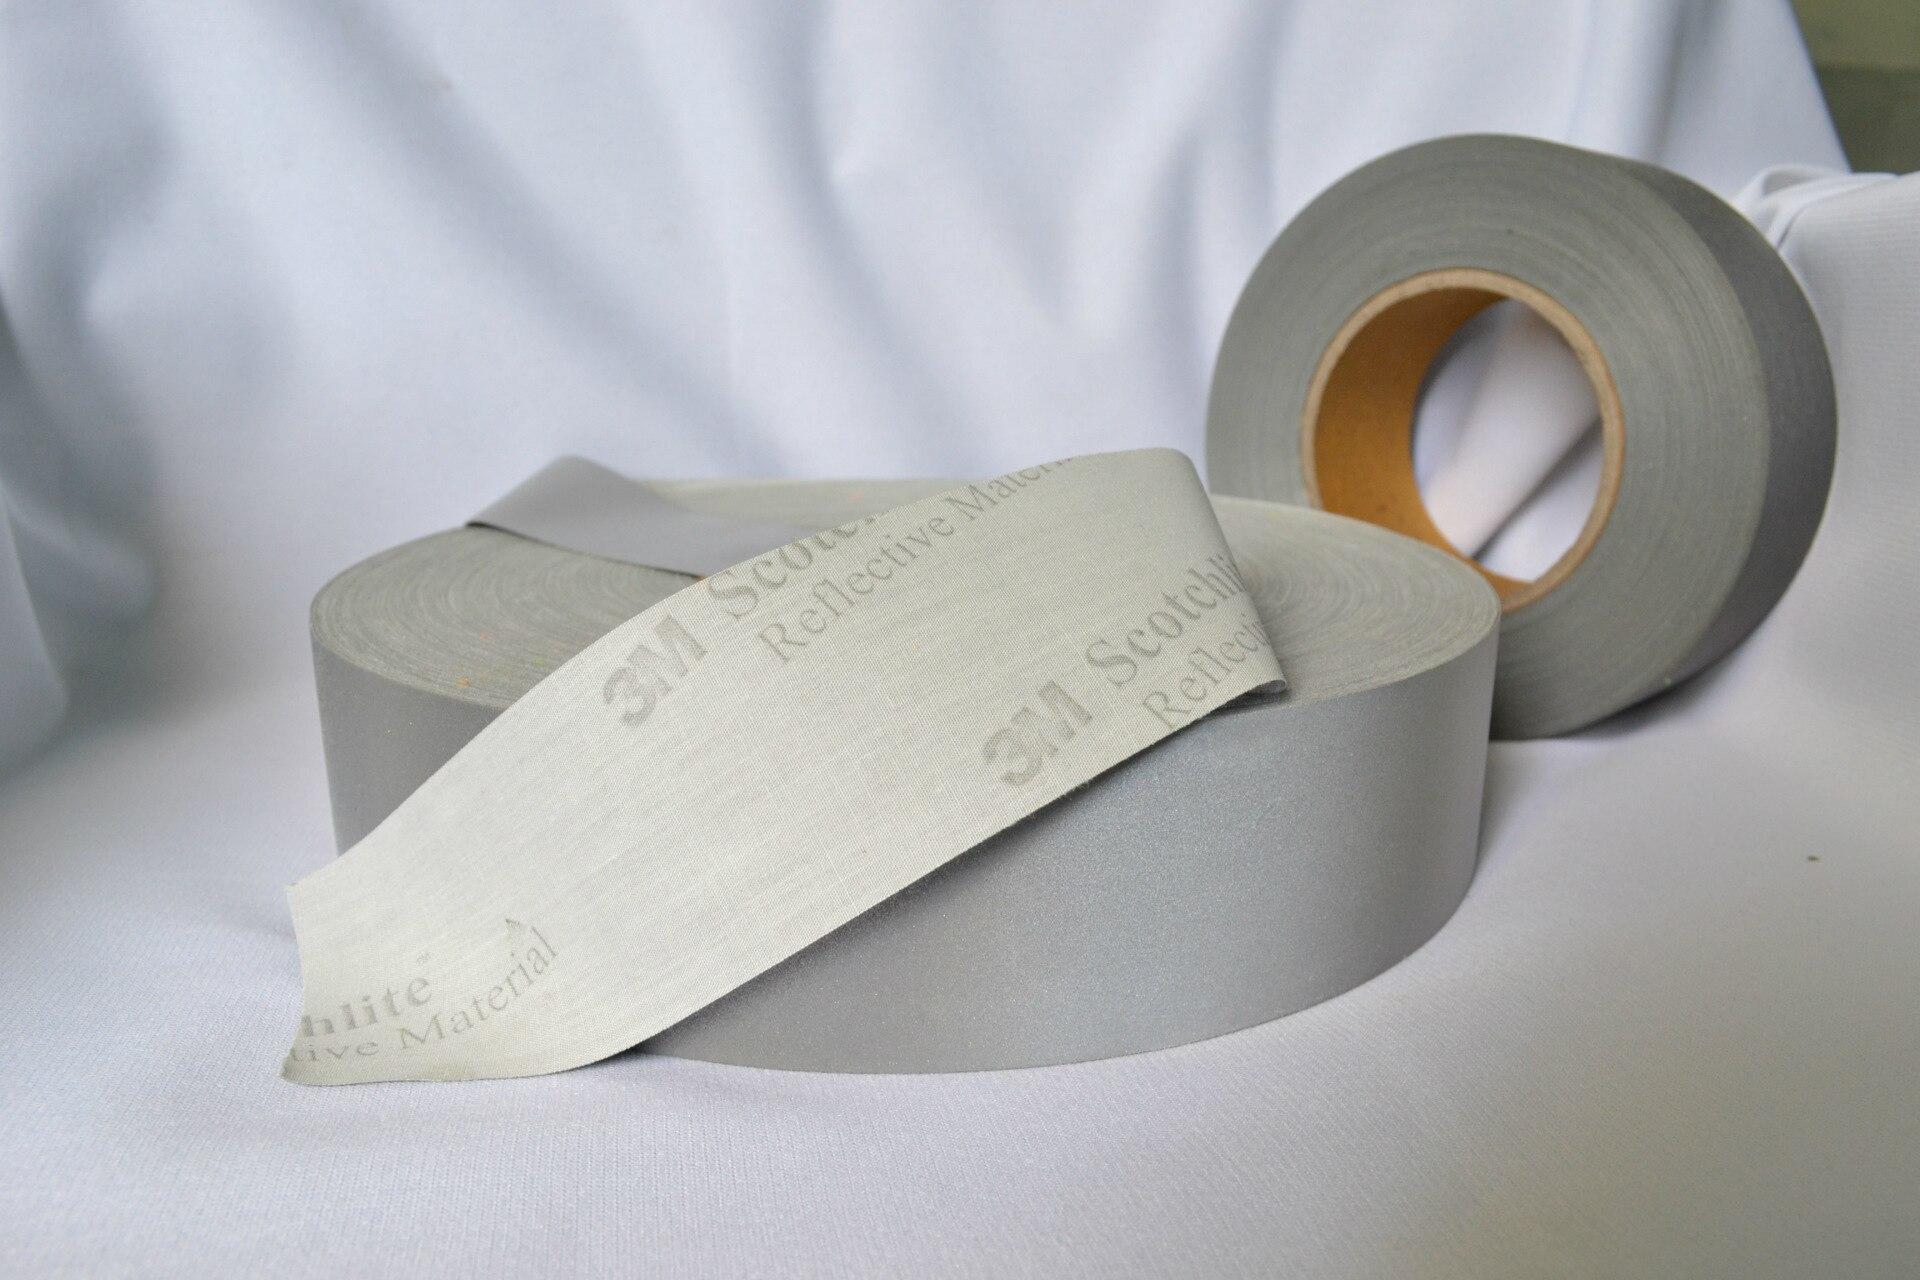 3M Reflective Material, 3M Reflective Stripe 8906 8910 Reflective Strips